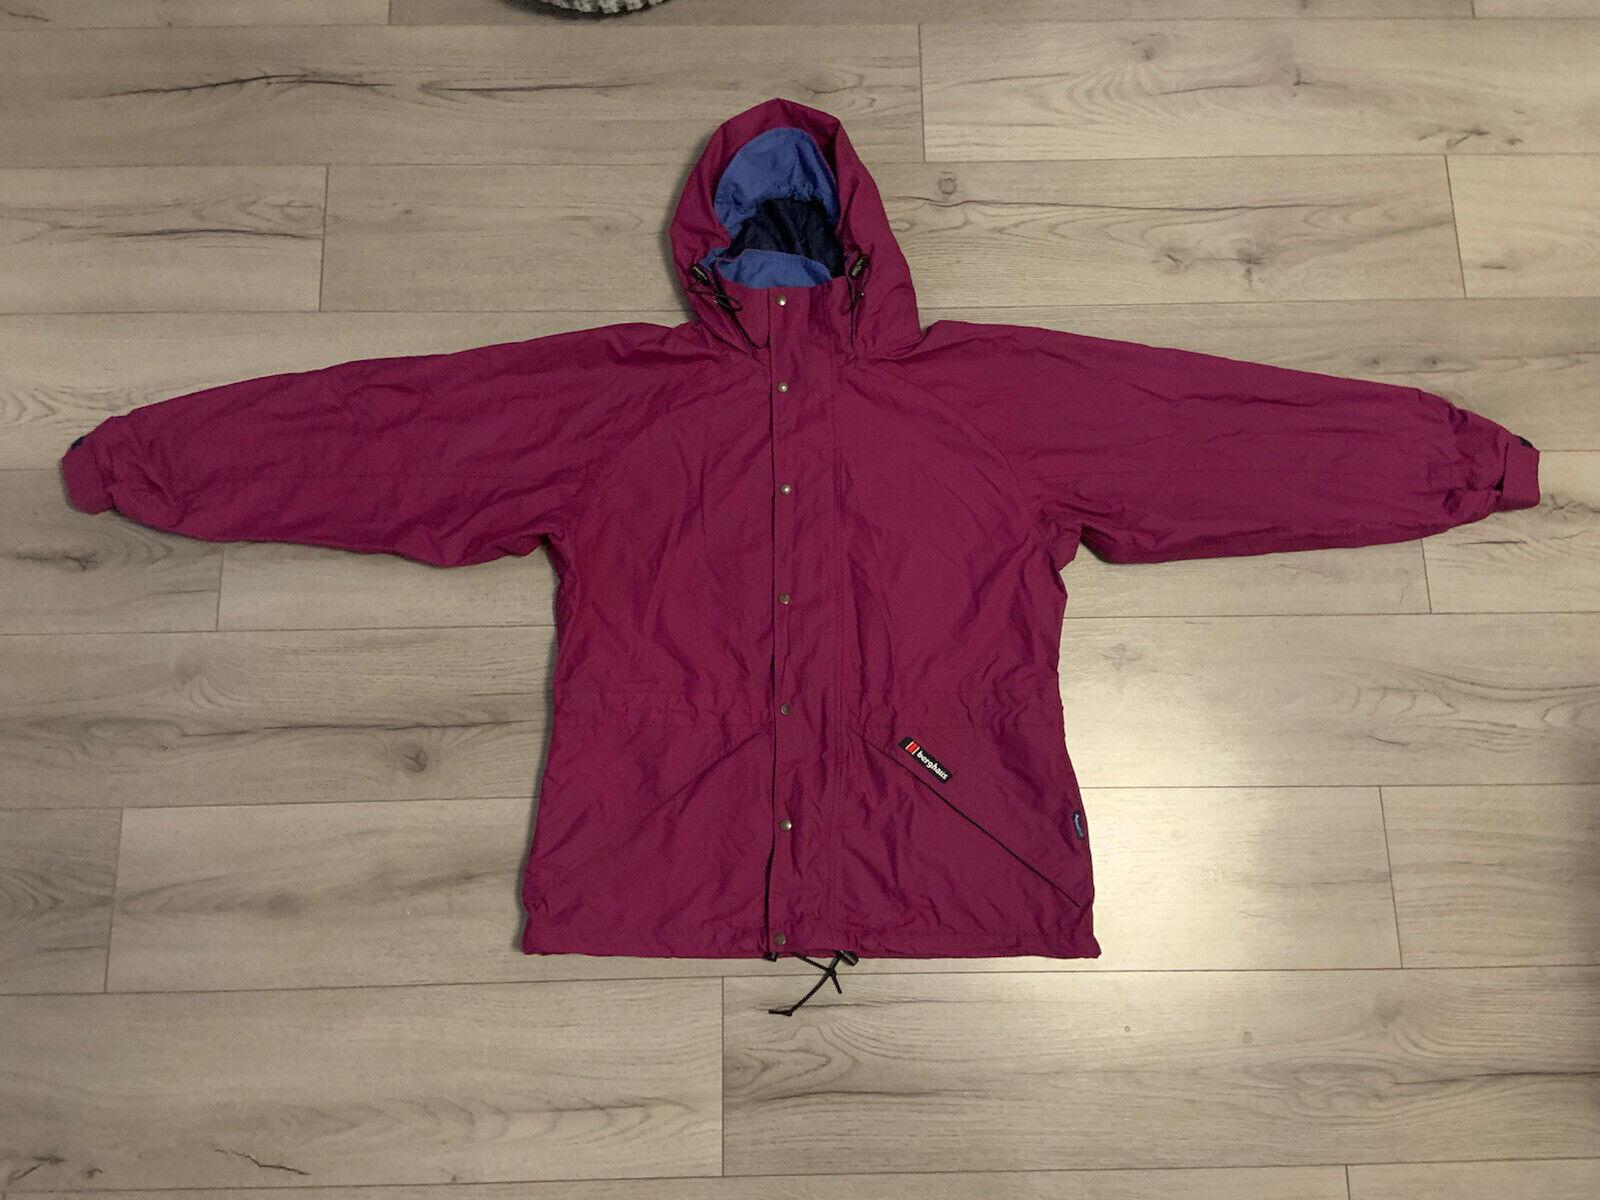 Berghaus Ladies Vintage Aquafoil Hooded Raincoat Jacket Size UK 14 Used In VGC✅